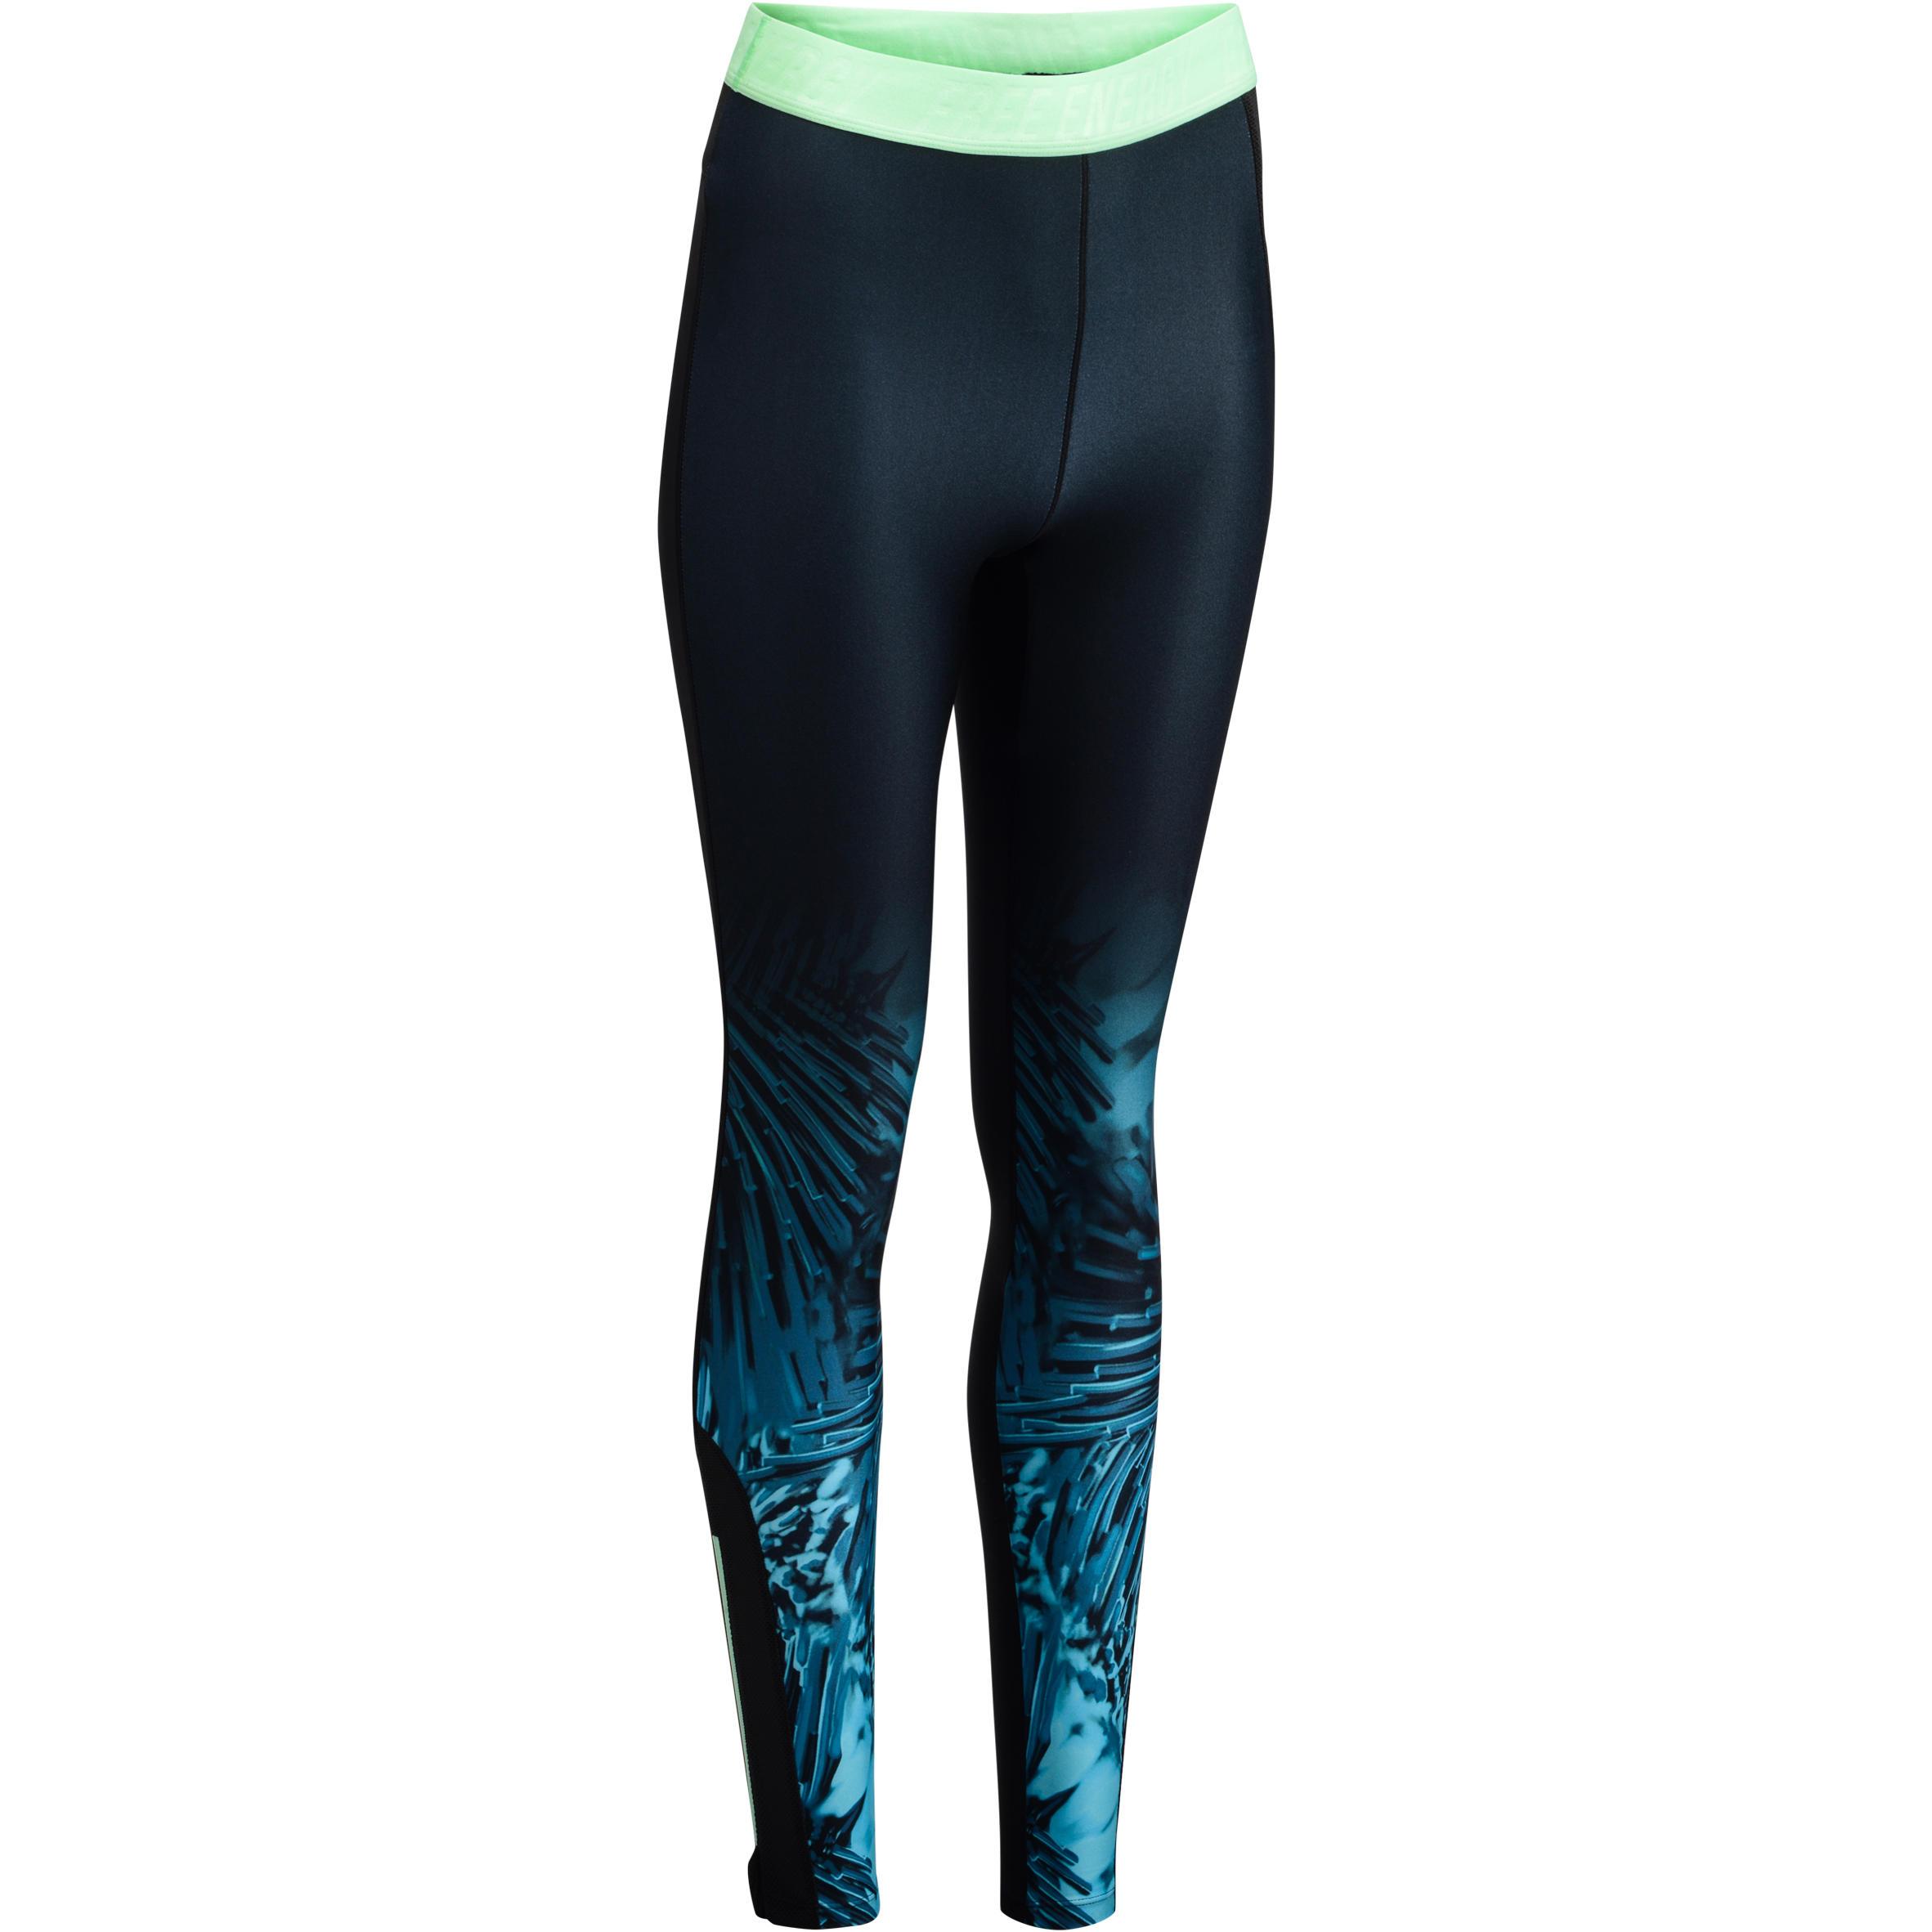 500 Women's Cardio Leggings - Black with Blue Tropical Print